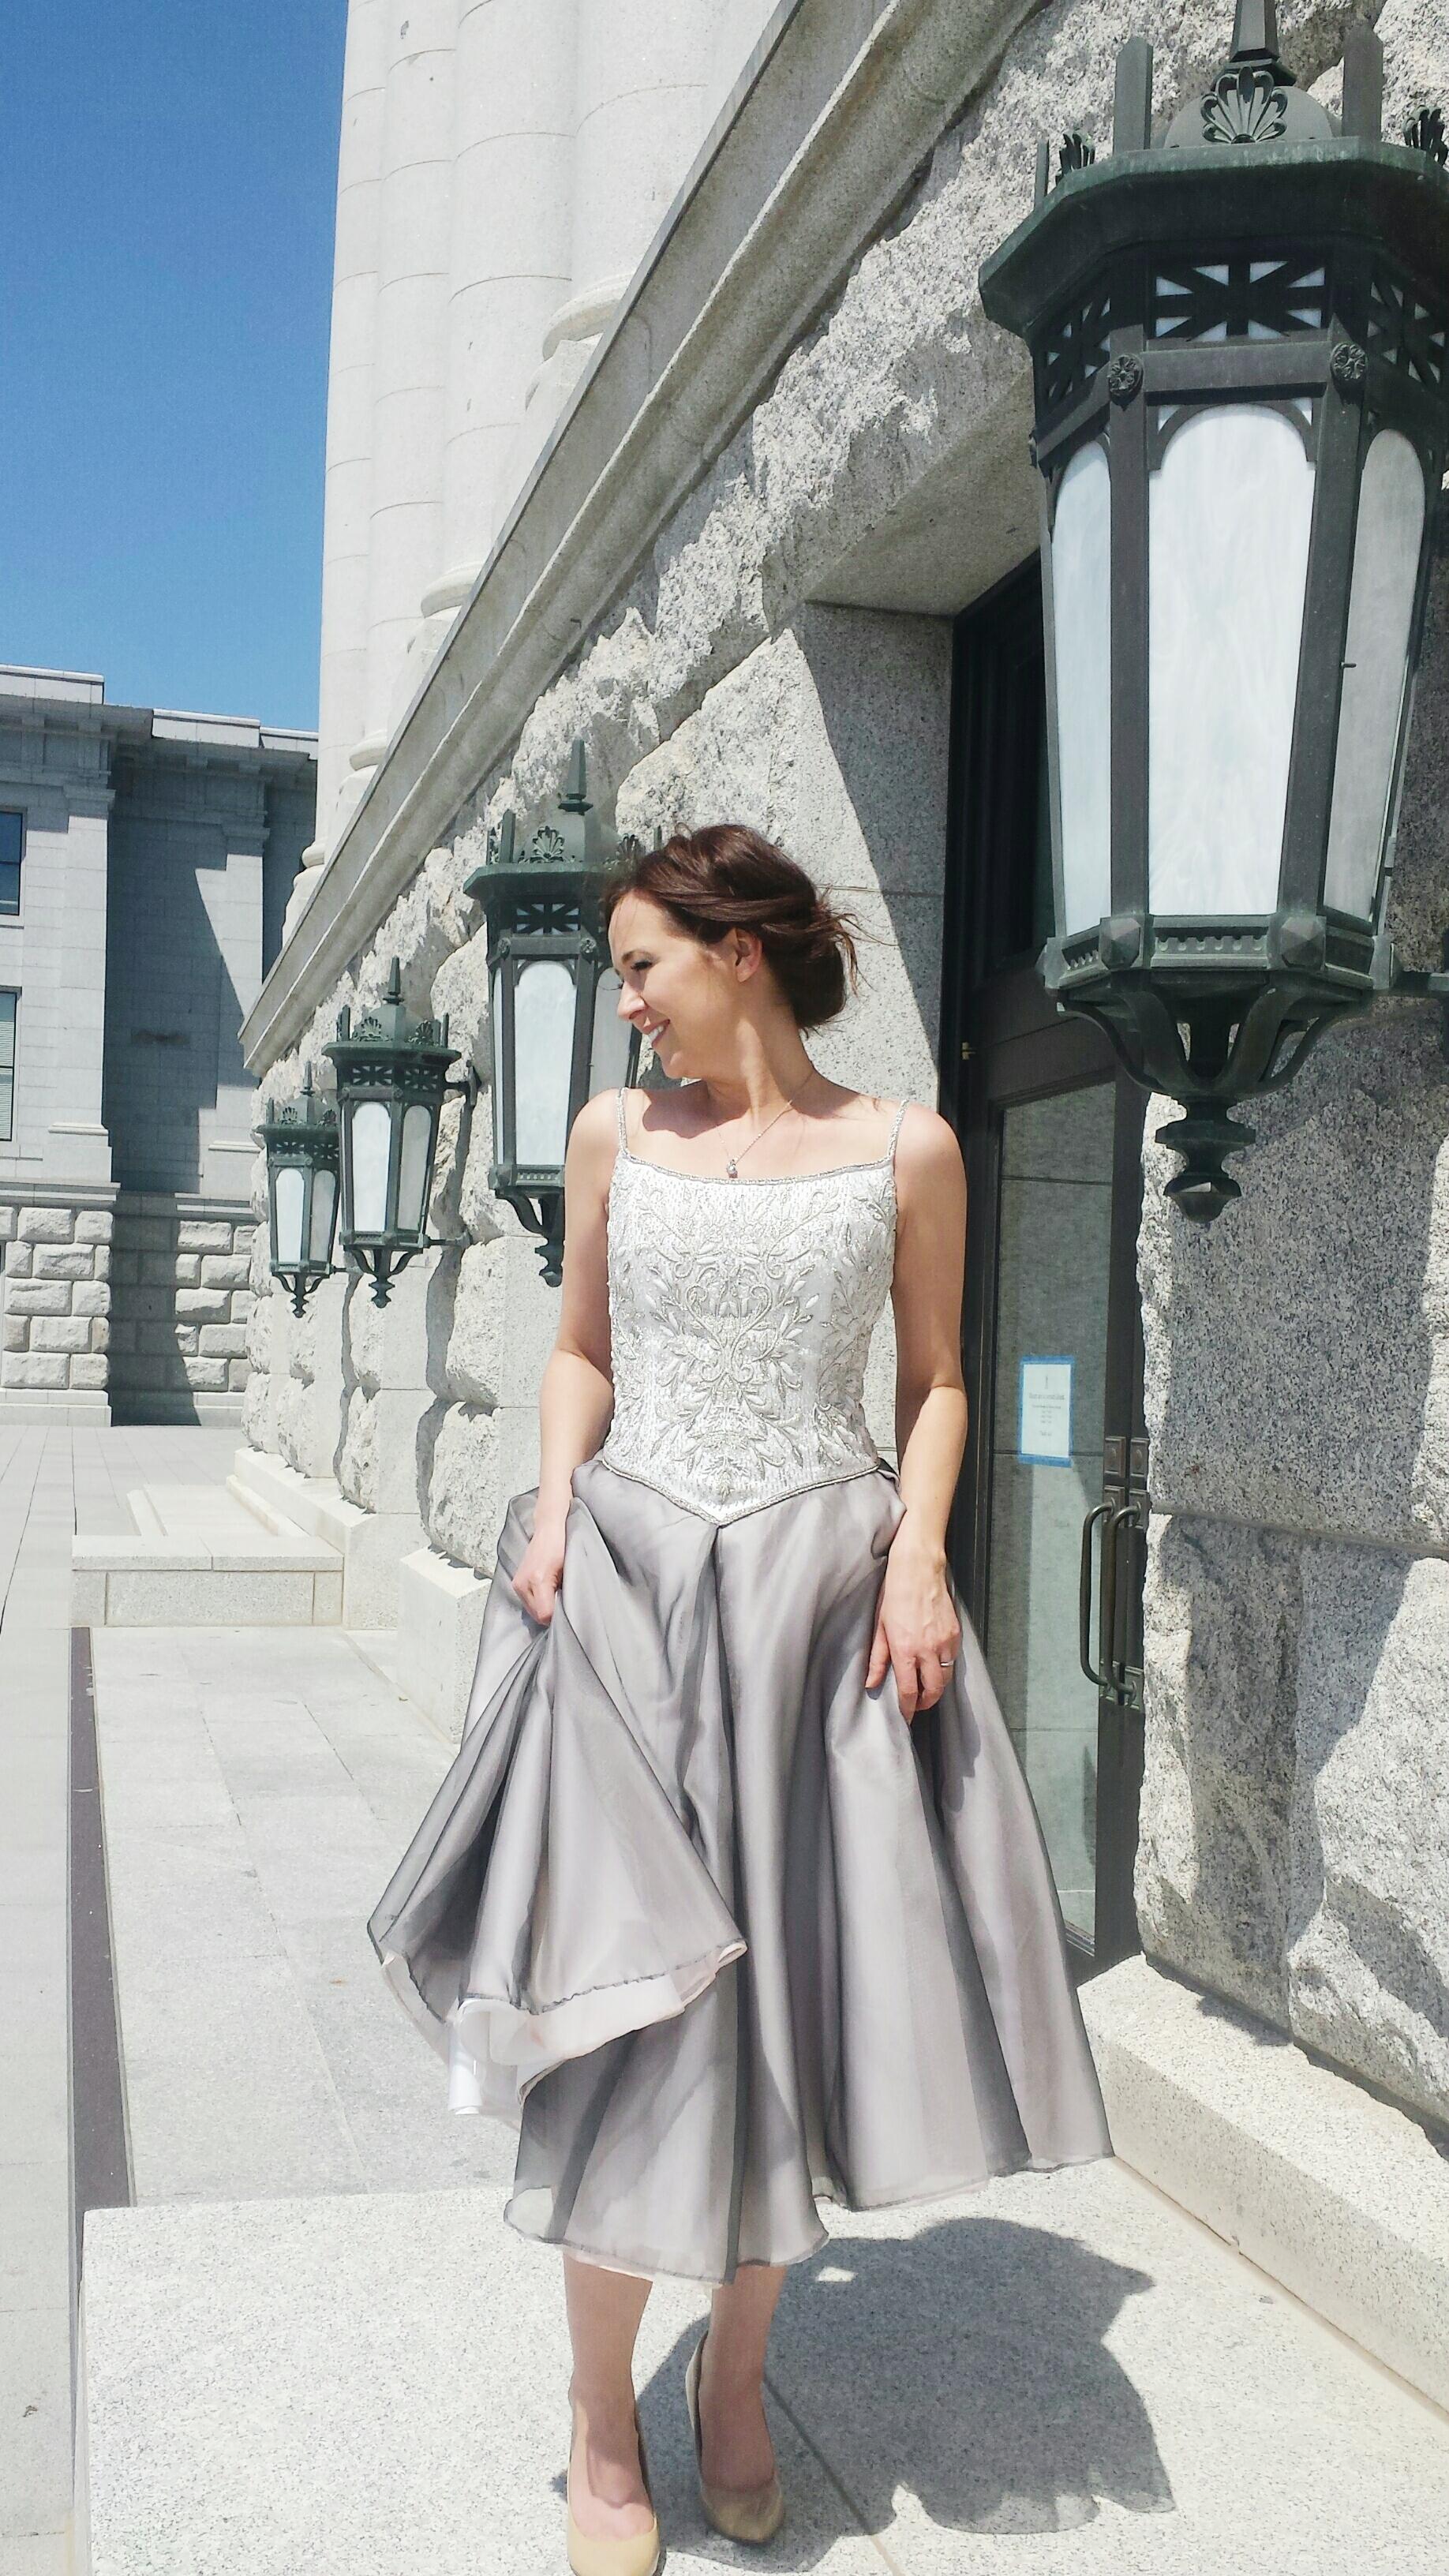 wedding_dress_conversion_she_wore_stars_fashion_tuille_silk_highheels_sequins_beads_cocktail_1.jpg